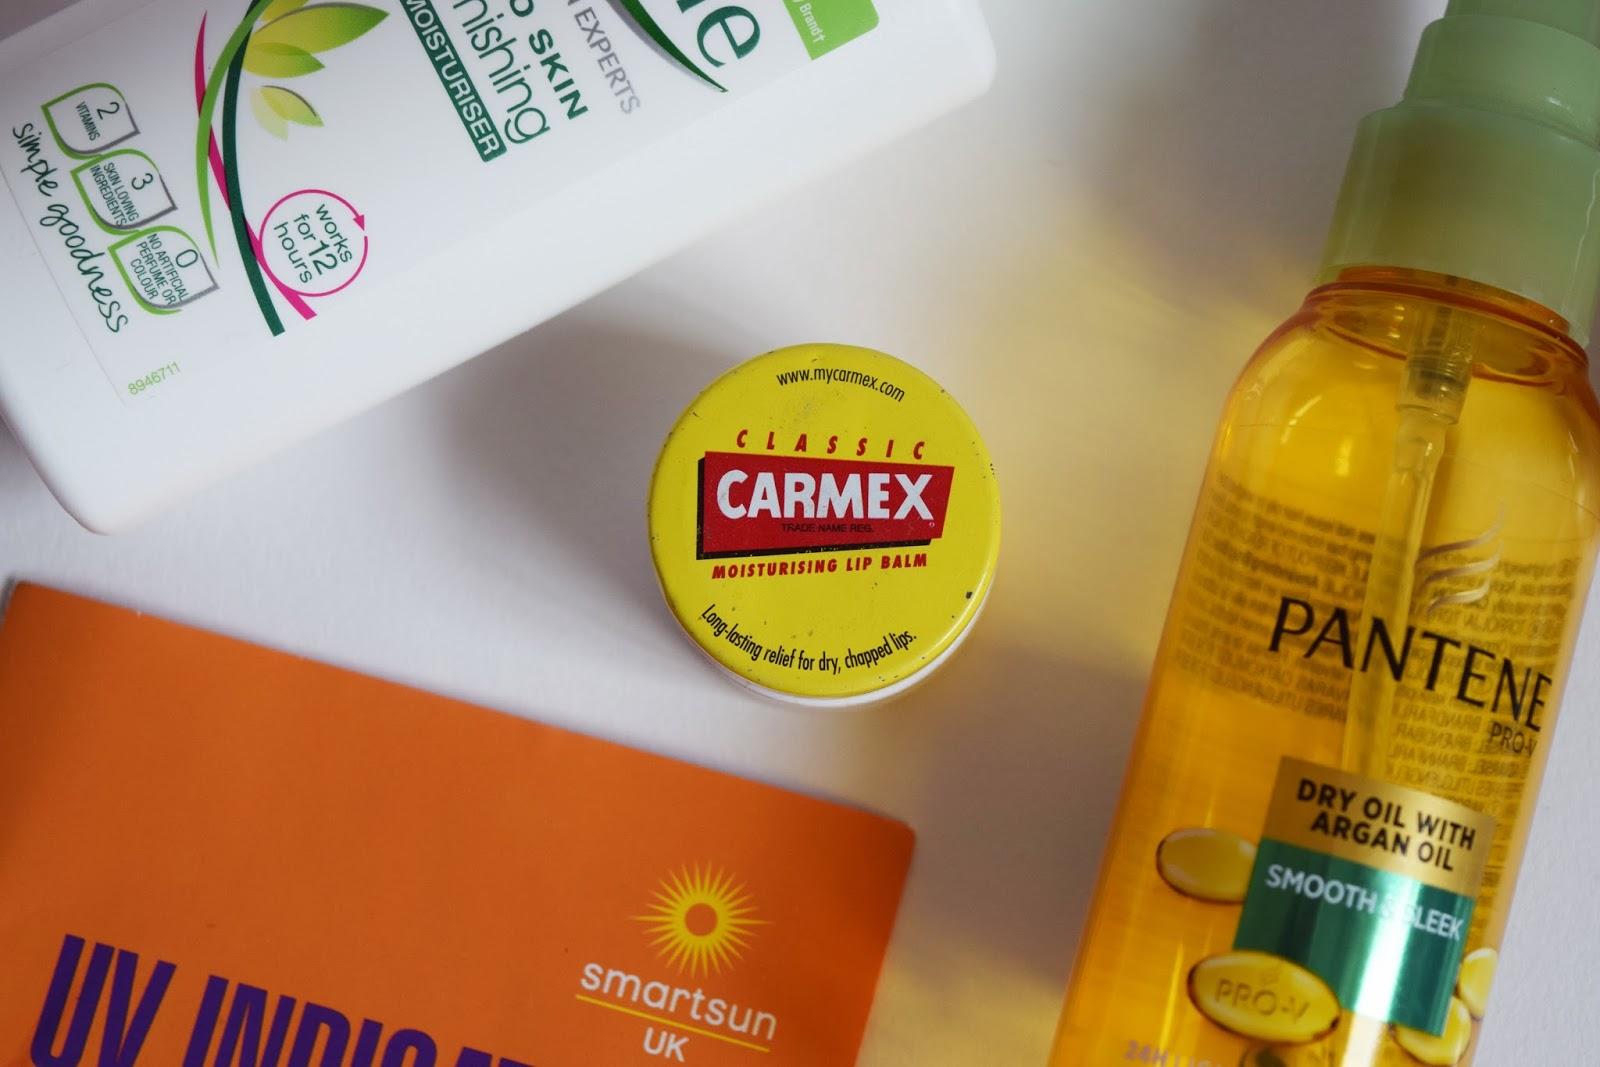 a close up shot of Carmex lip balm